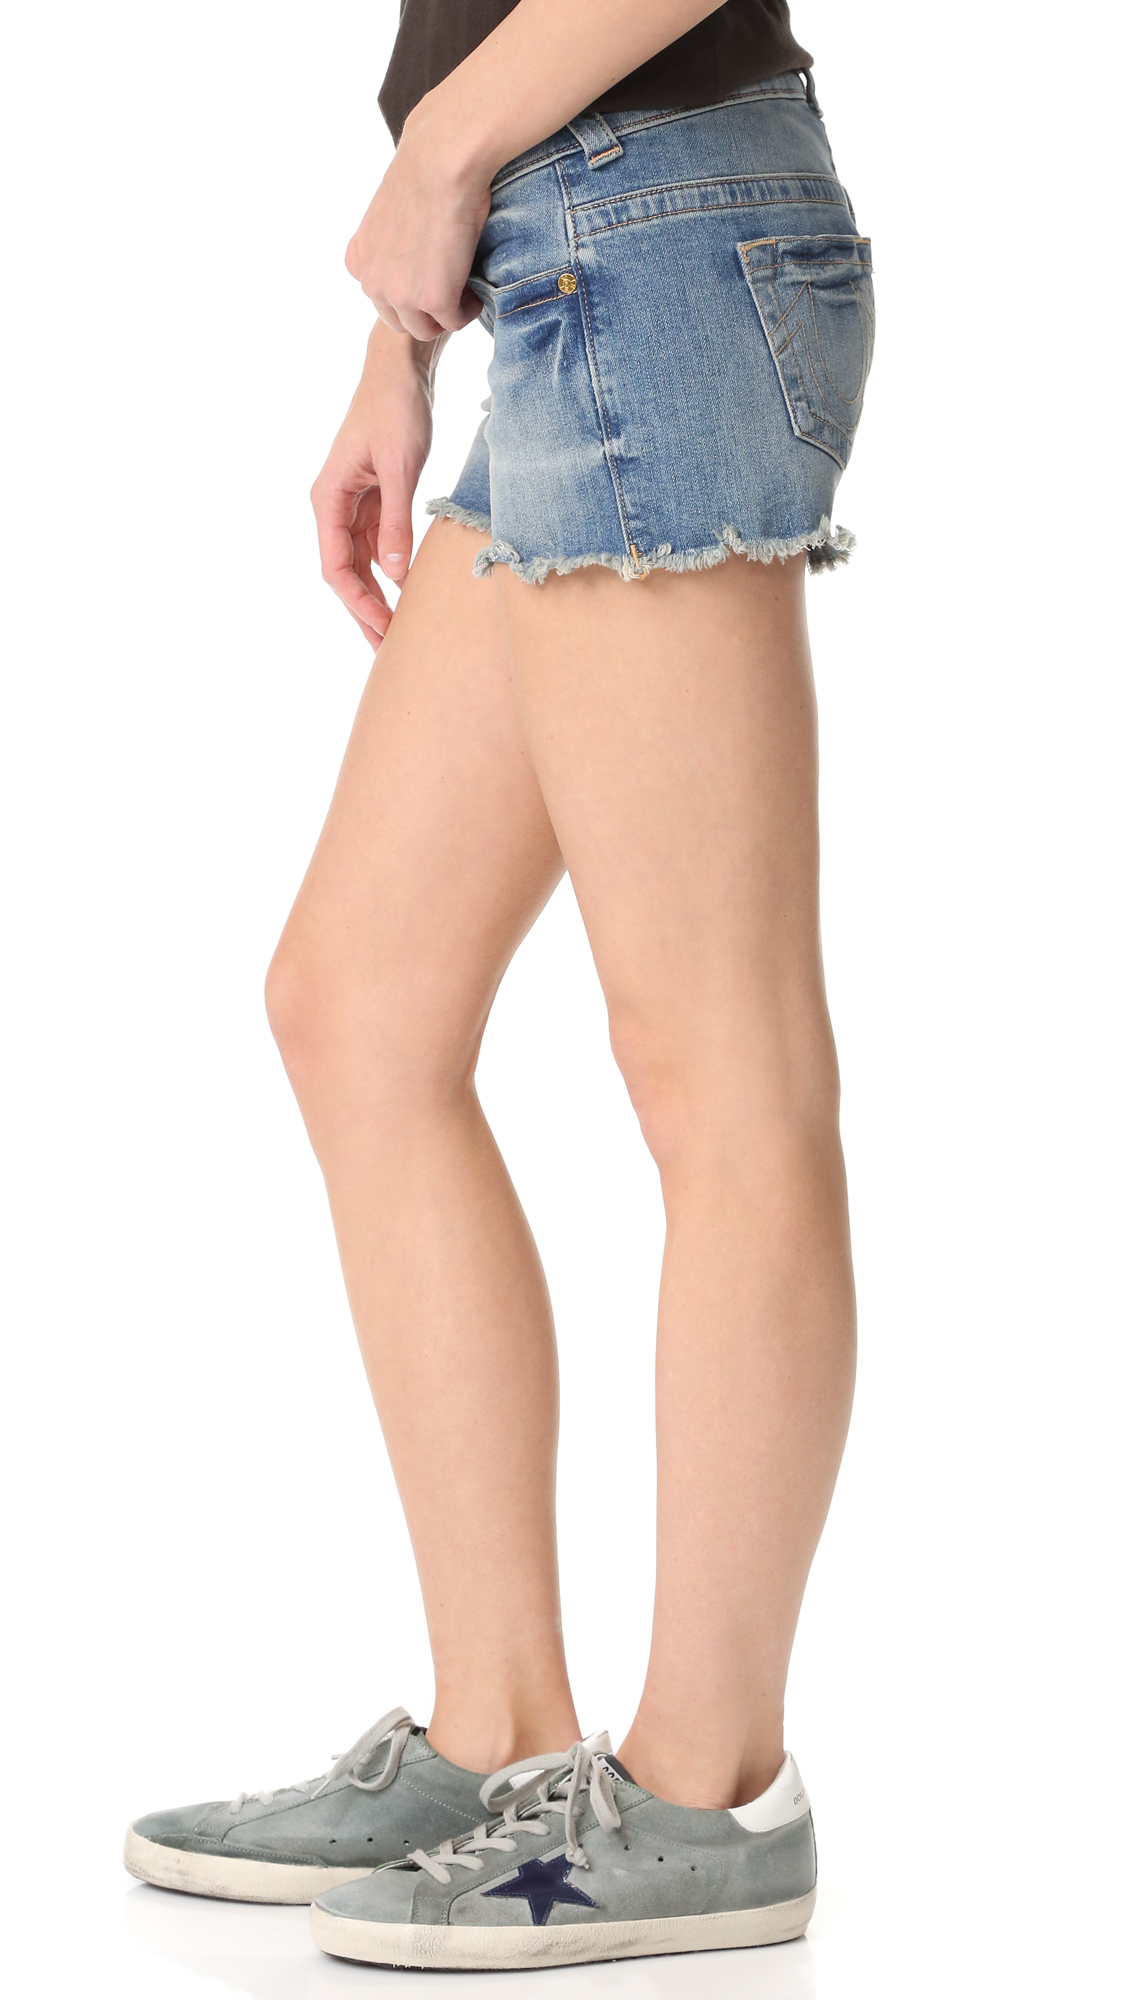 eb4c957bd True Religion Keira Low Rise Shorts